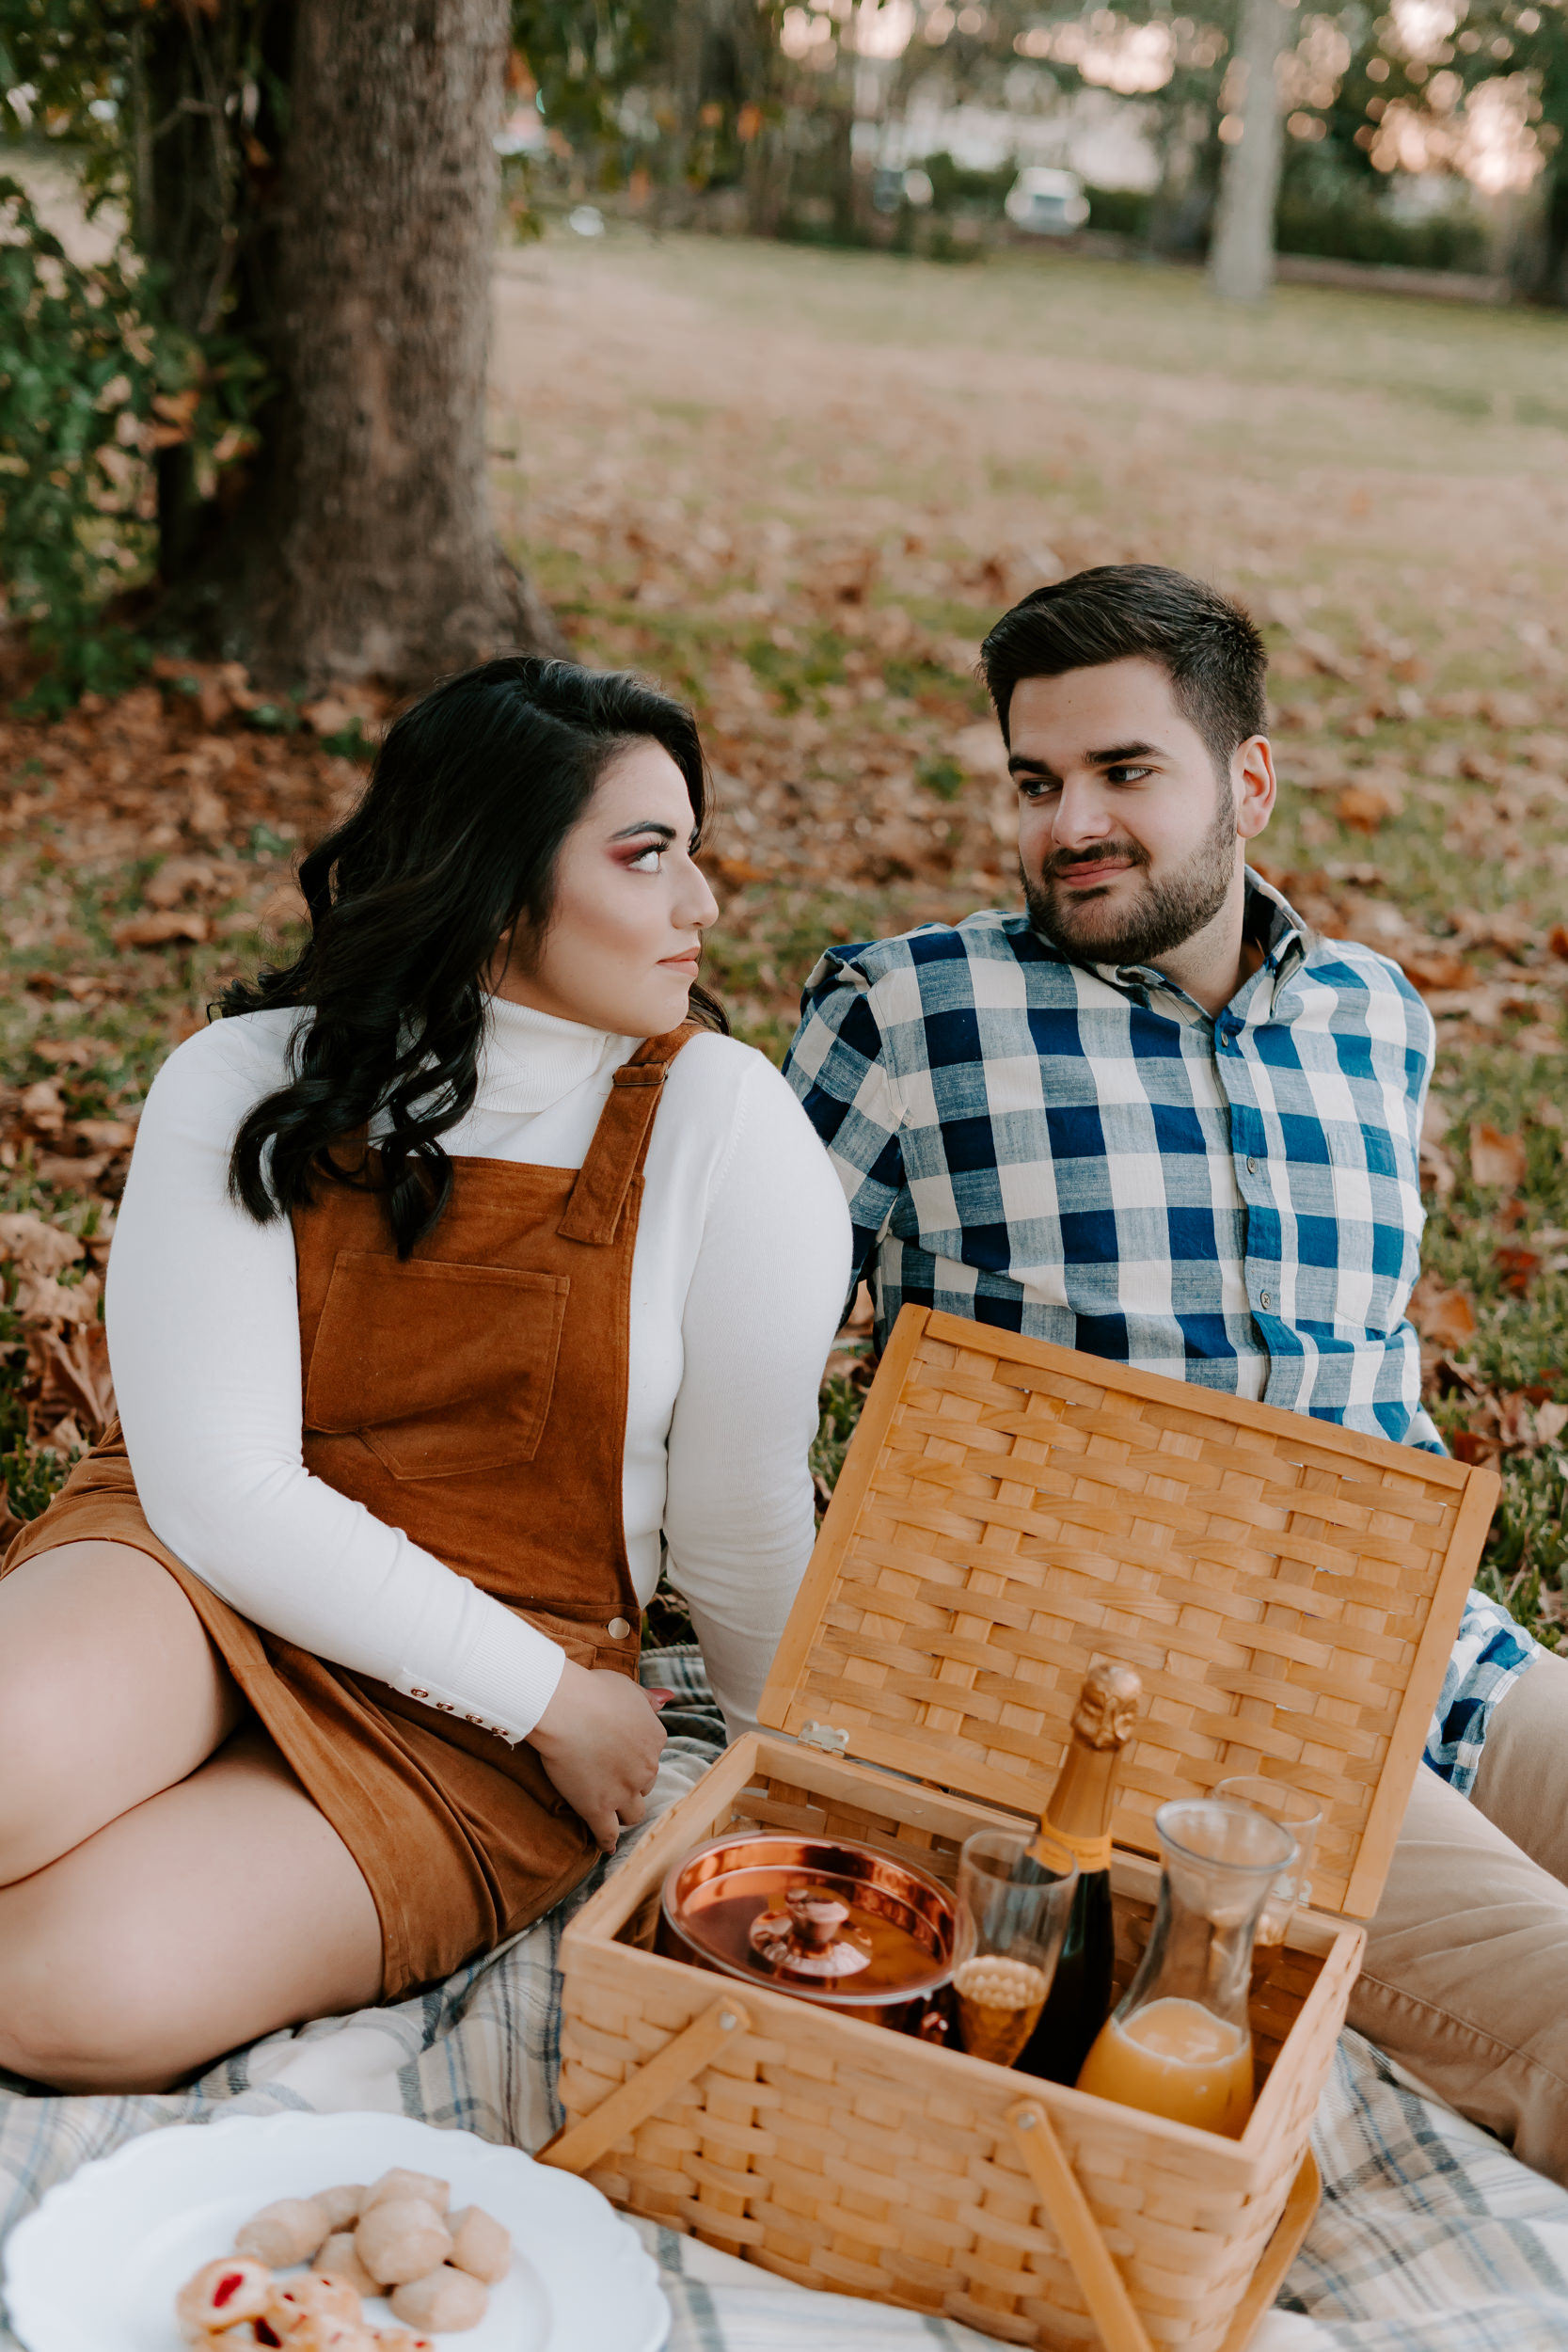 Intimate-Engagement-Photographers-Lake-Charles